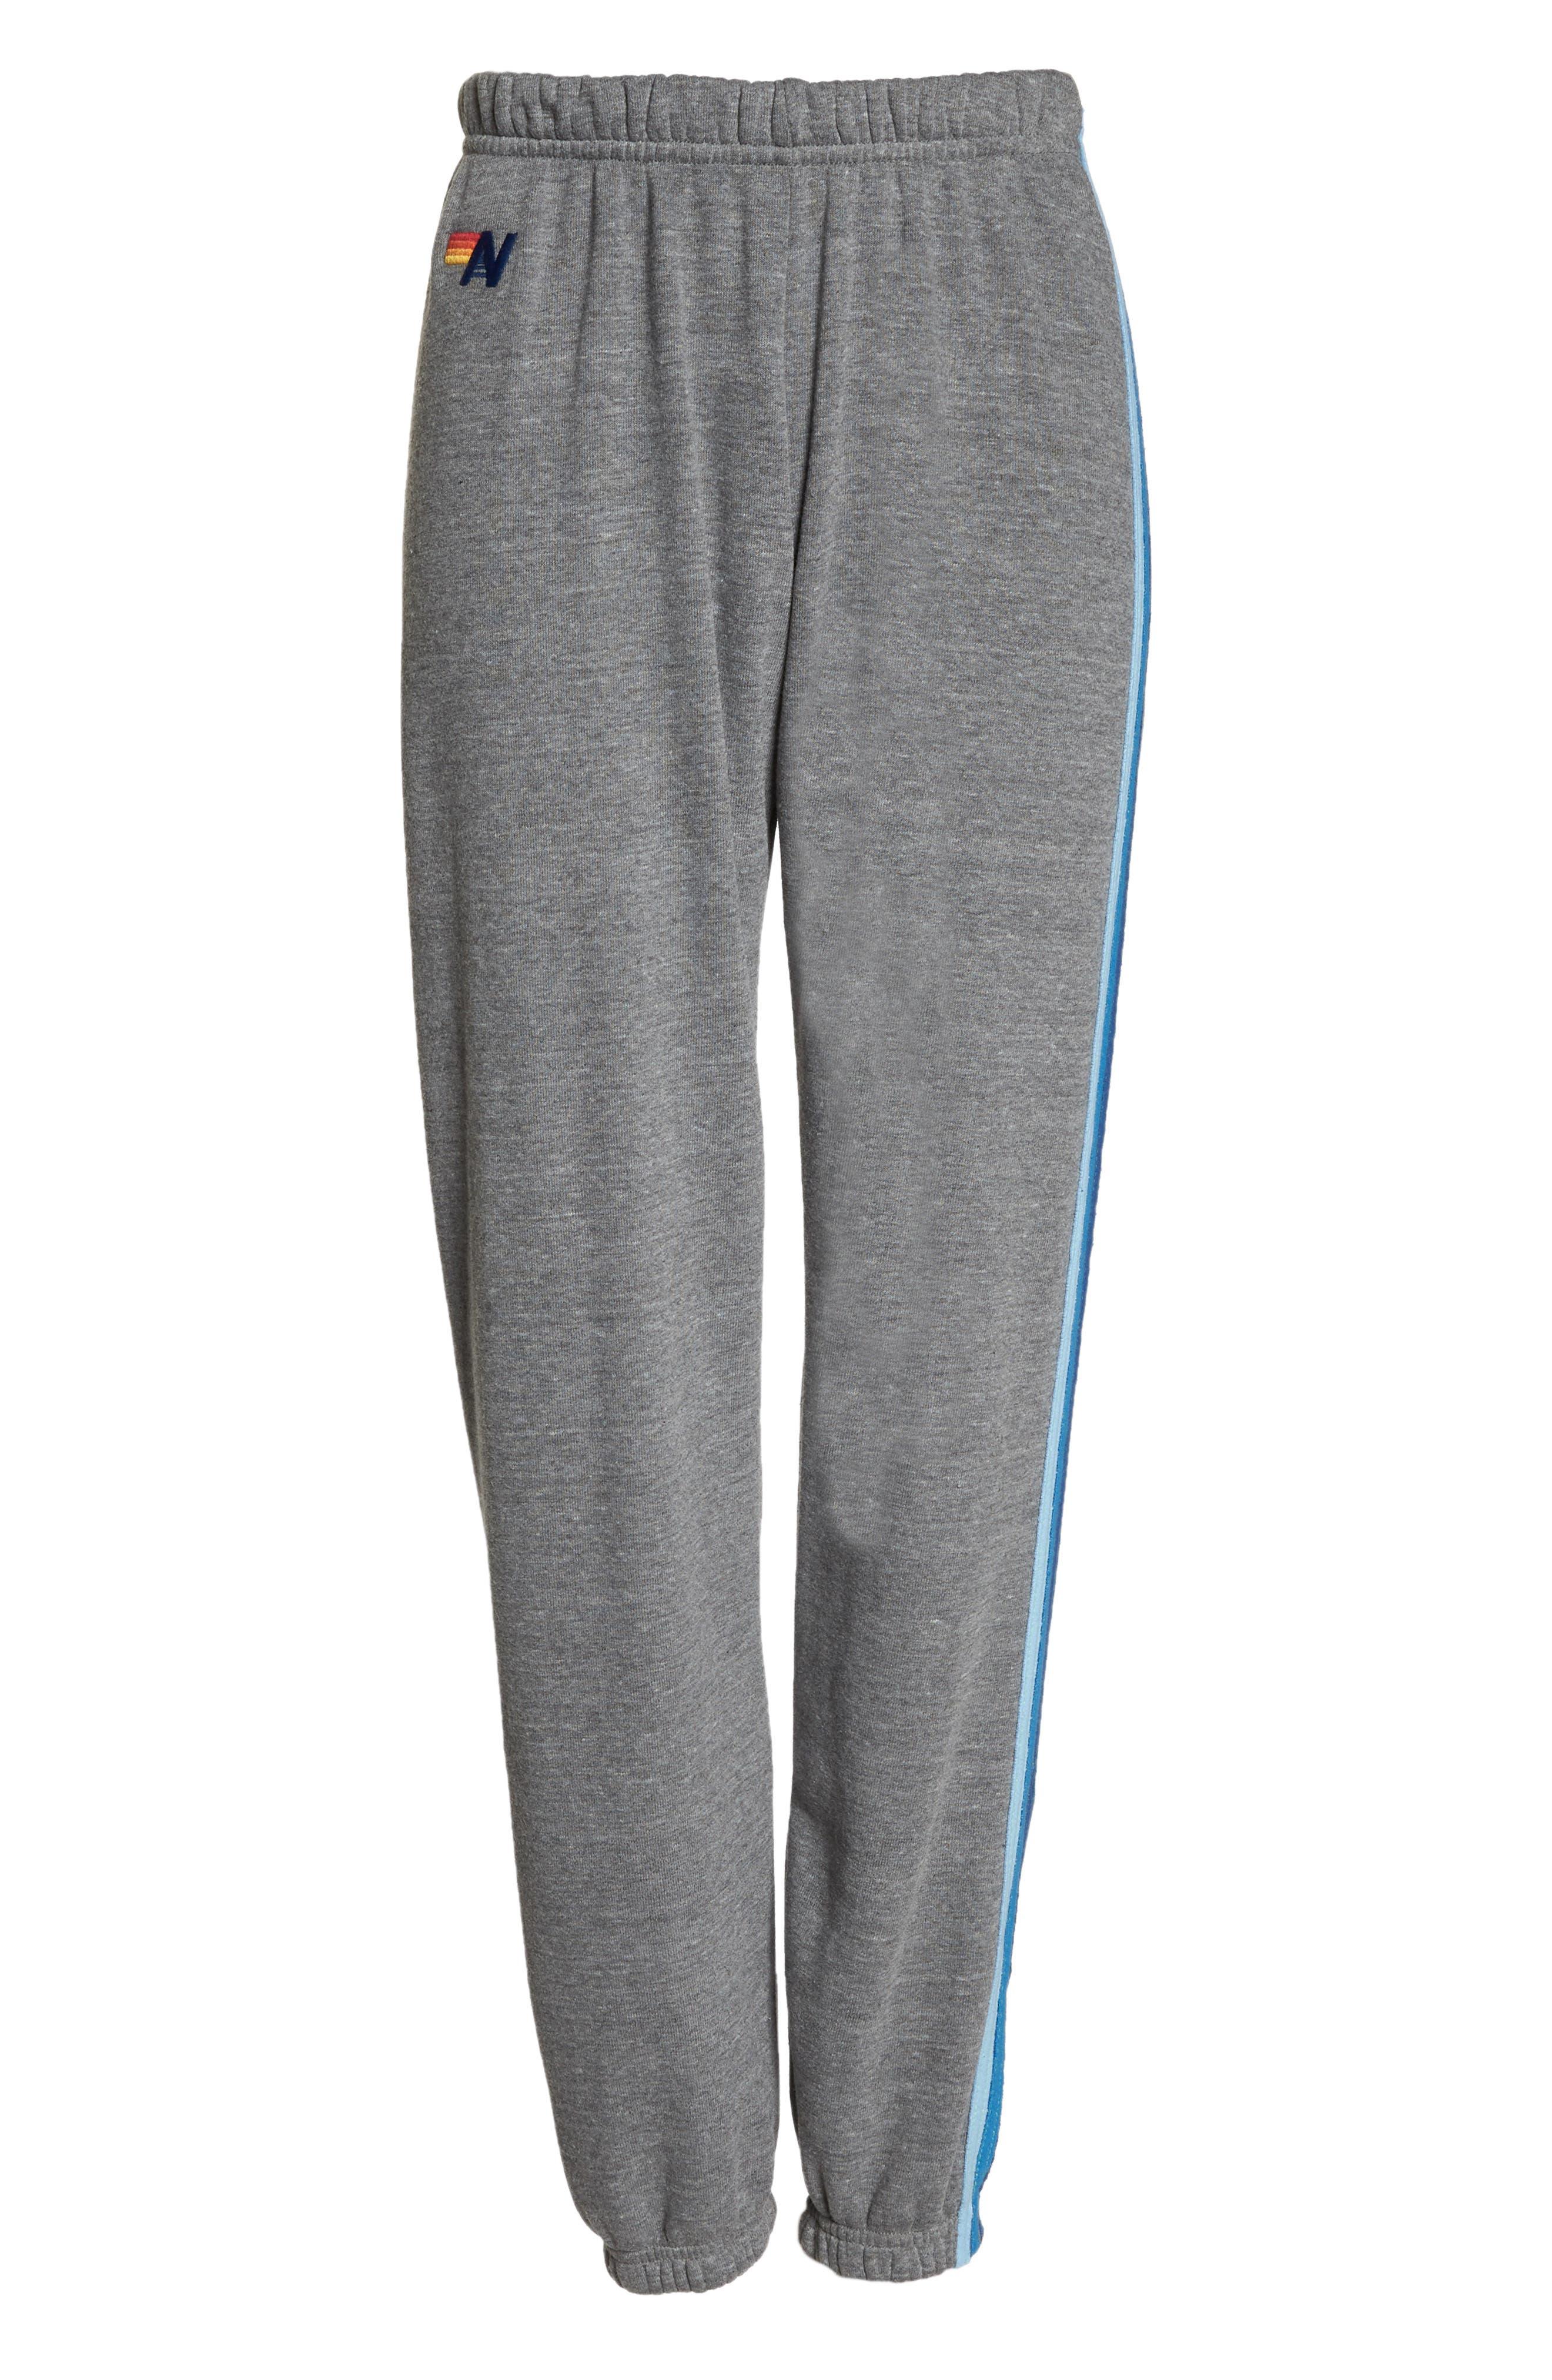 Stripe Sweatpants,                             Alternate thumbnail 4, color,                             Heather Grey/ Blue Stripes